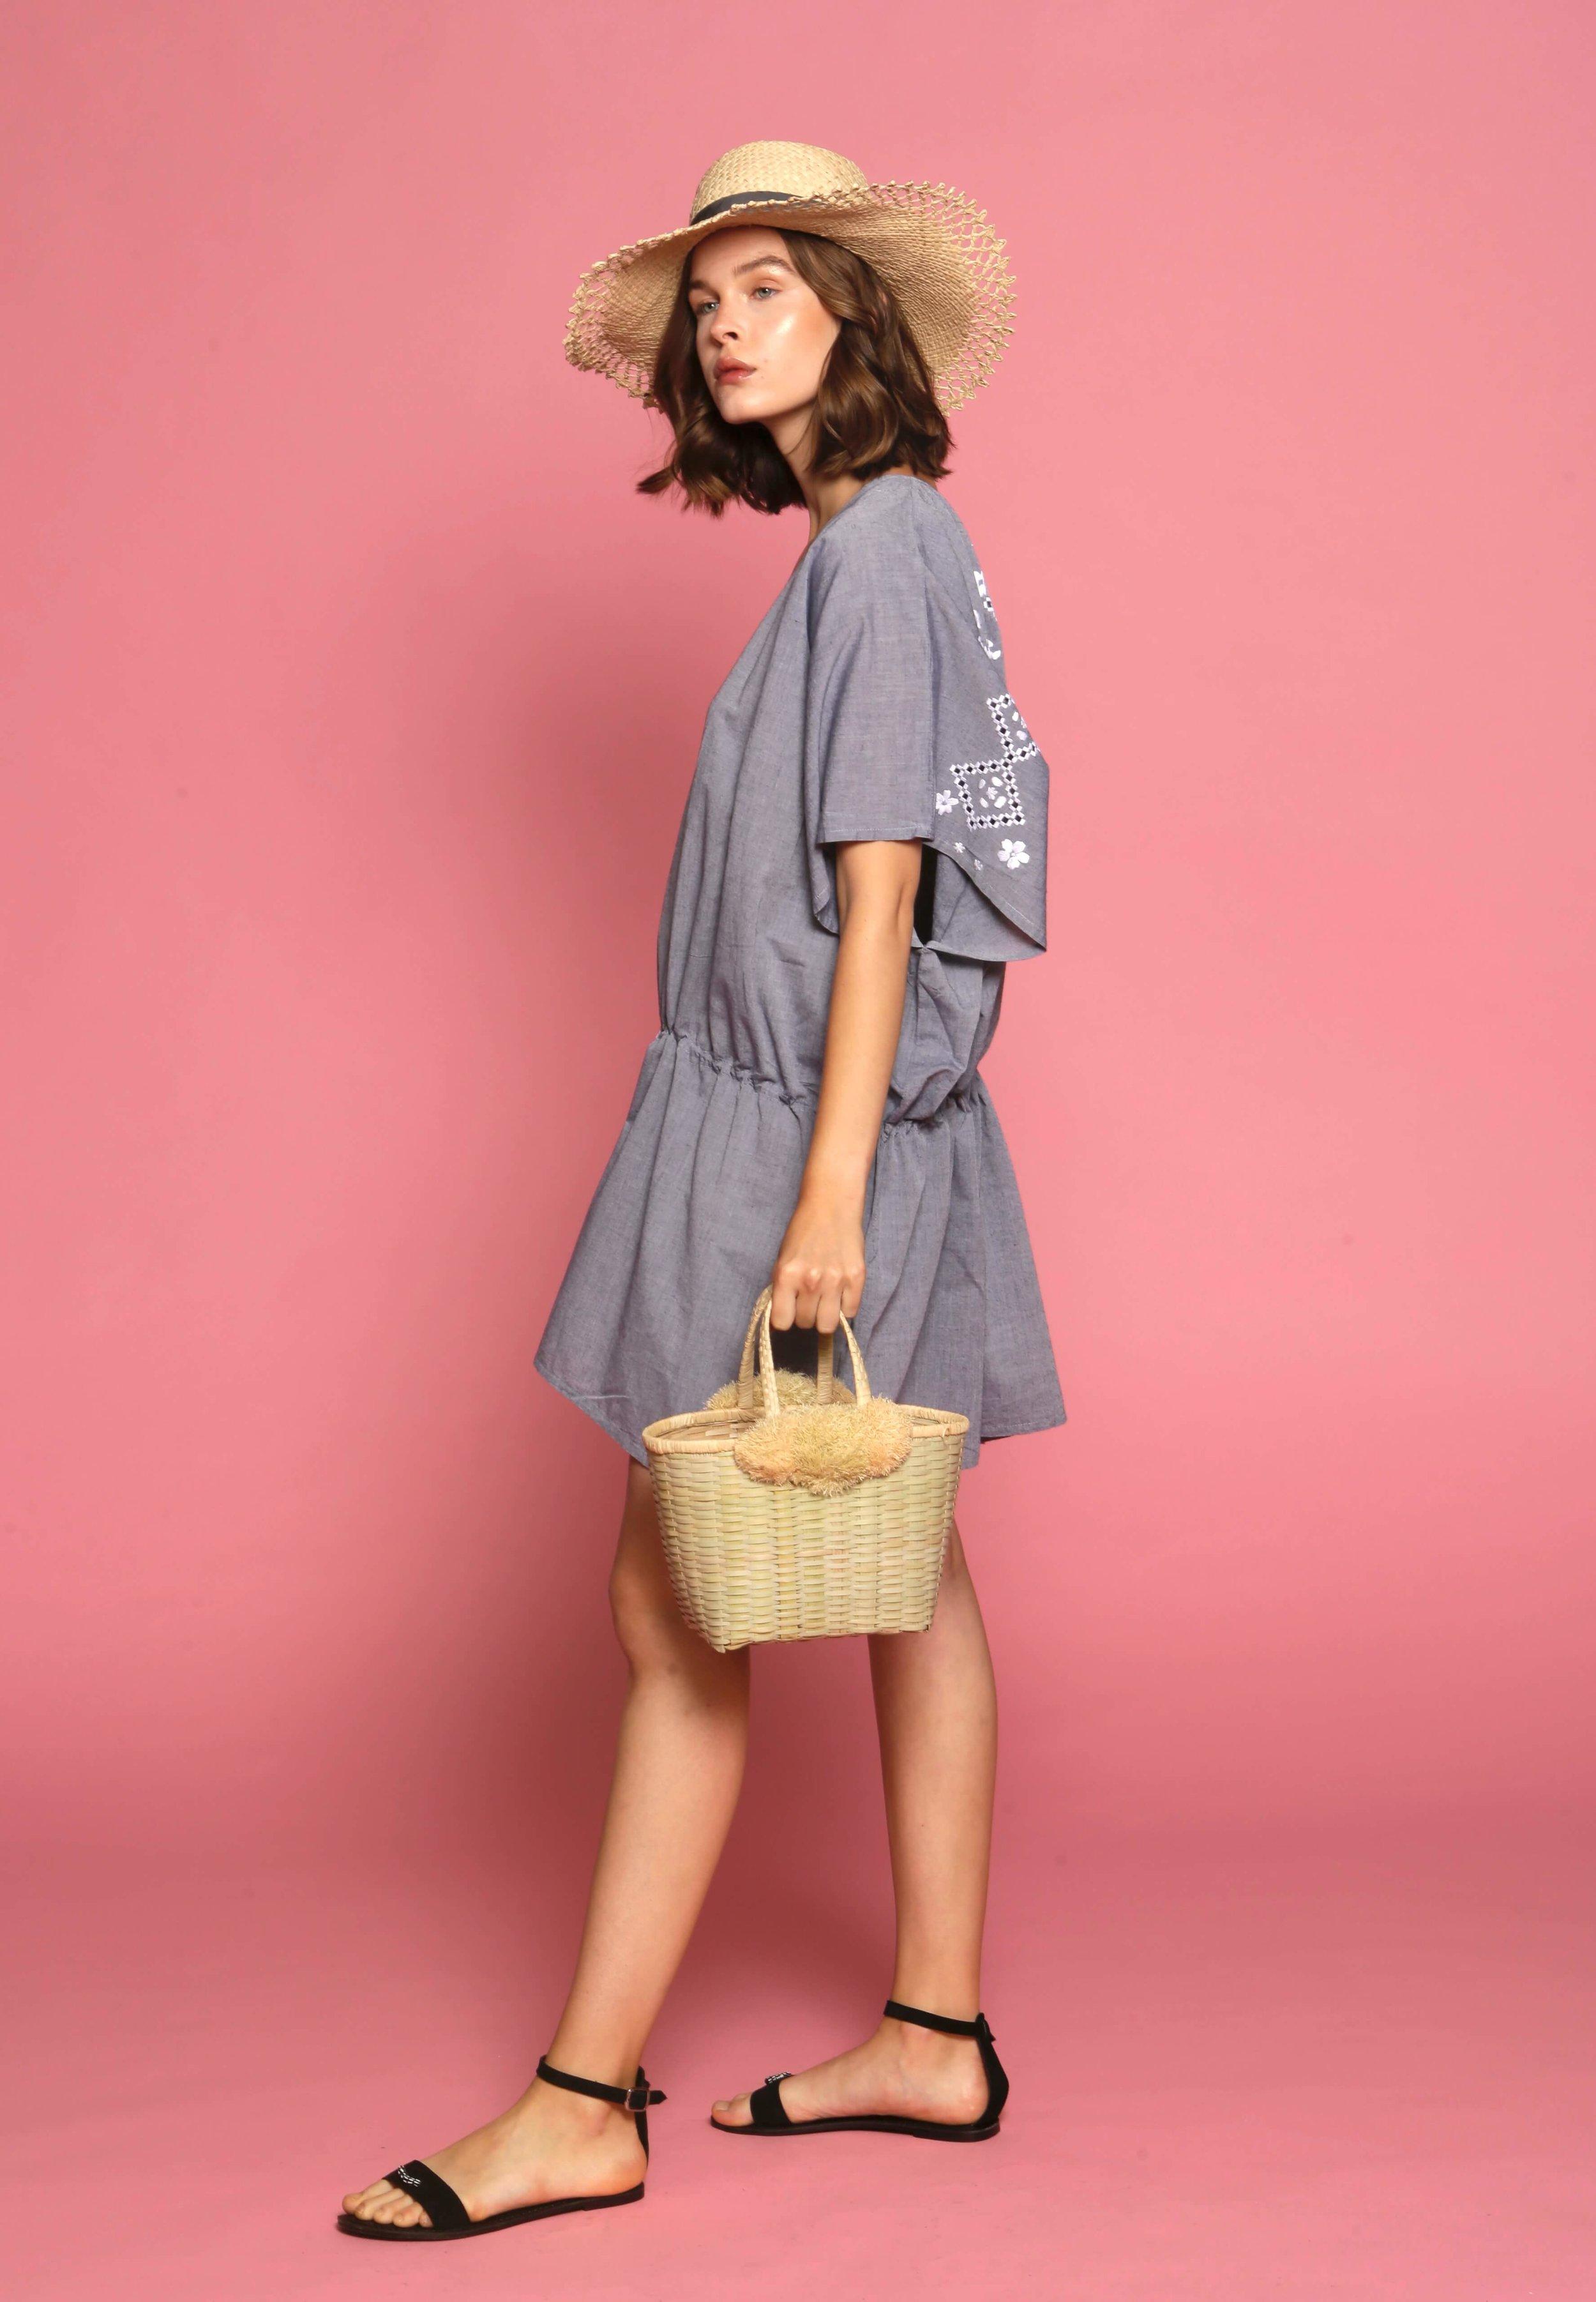 resortwear outfit maraina london.jpeg